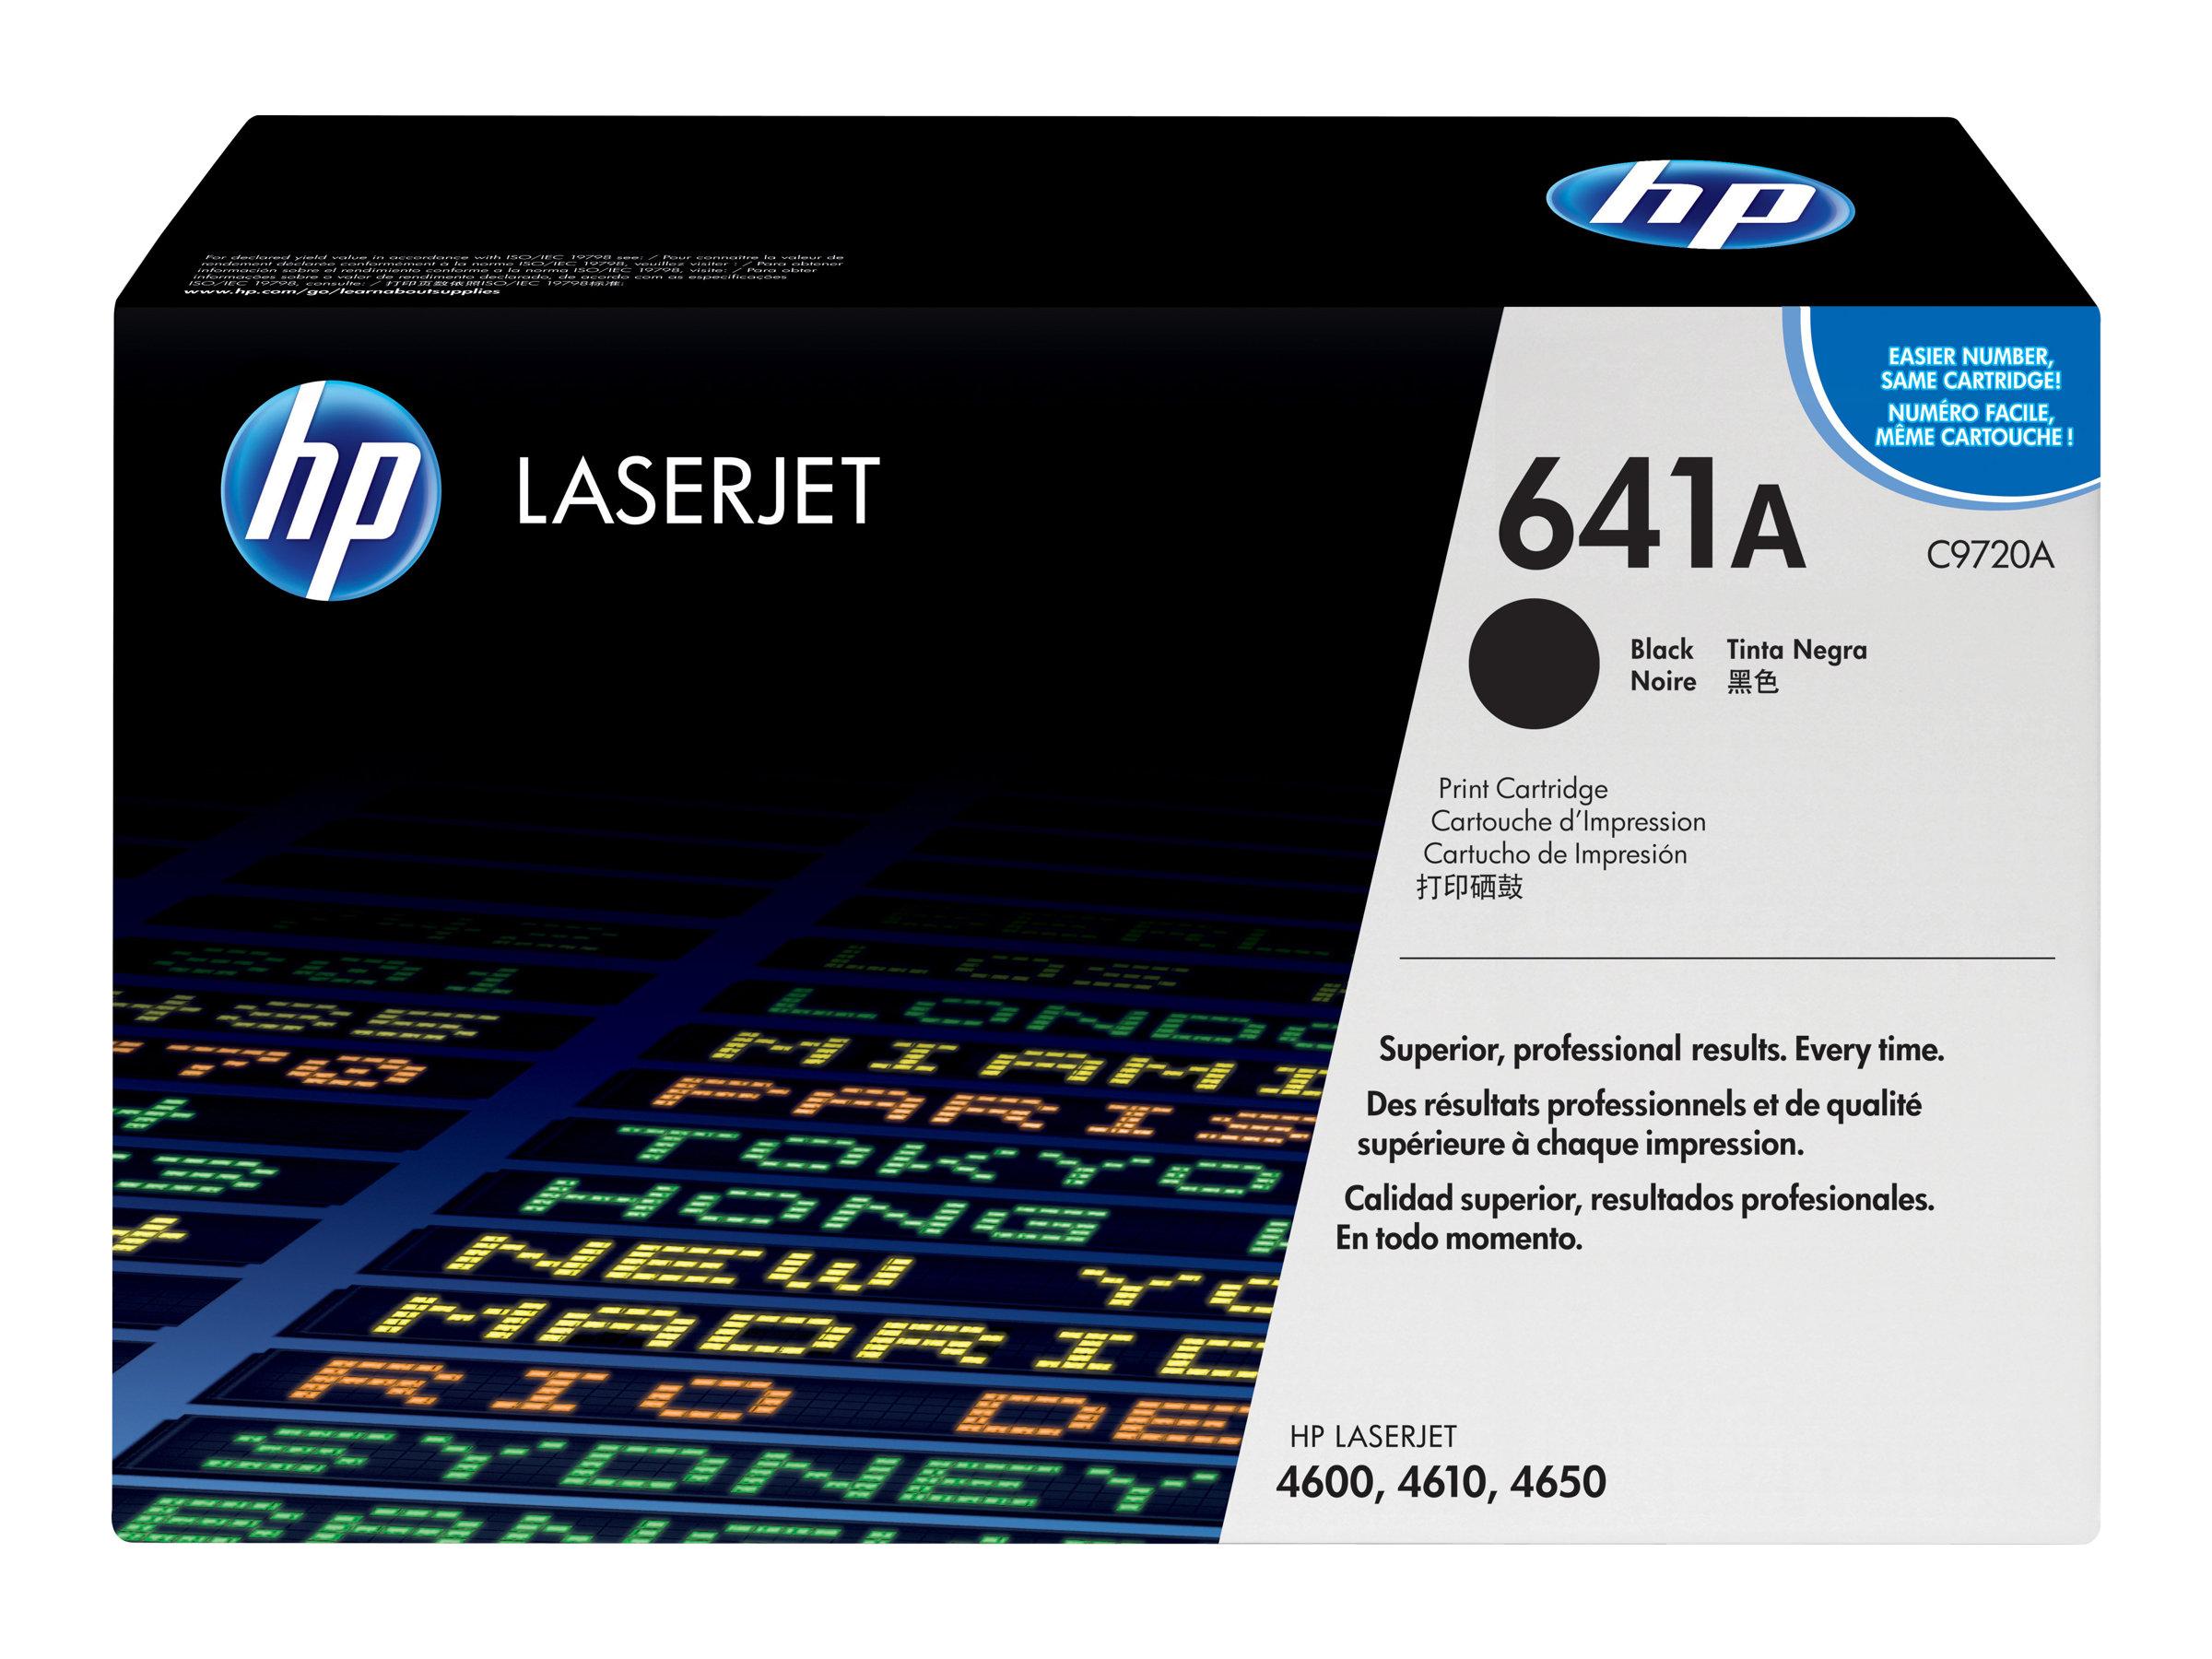 HP 641A - Schwarz - Original - LaserJet - Tonerpatrone (C9720A) - für Color LaserJet 4600, 4610, 4650